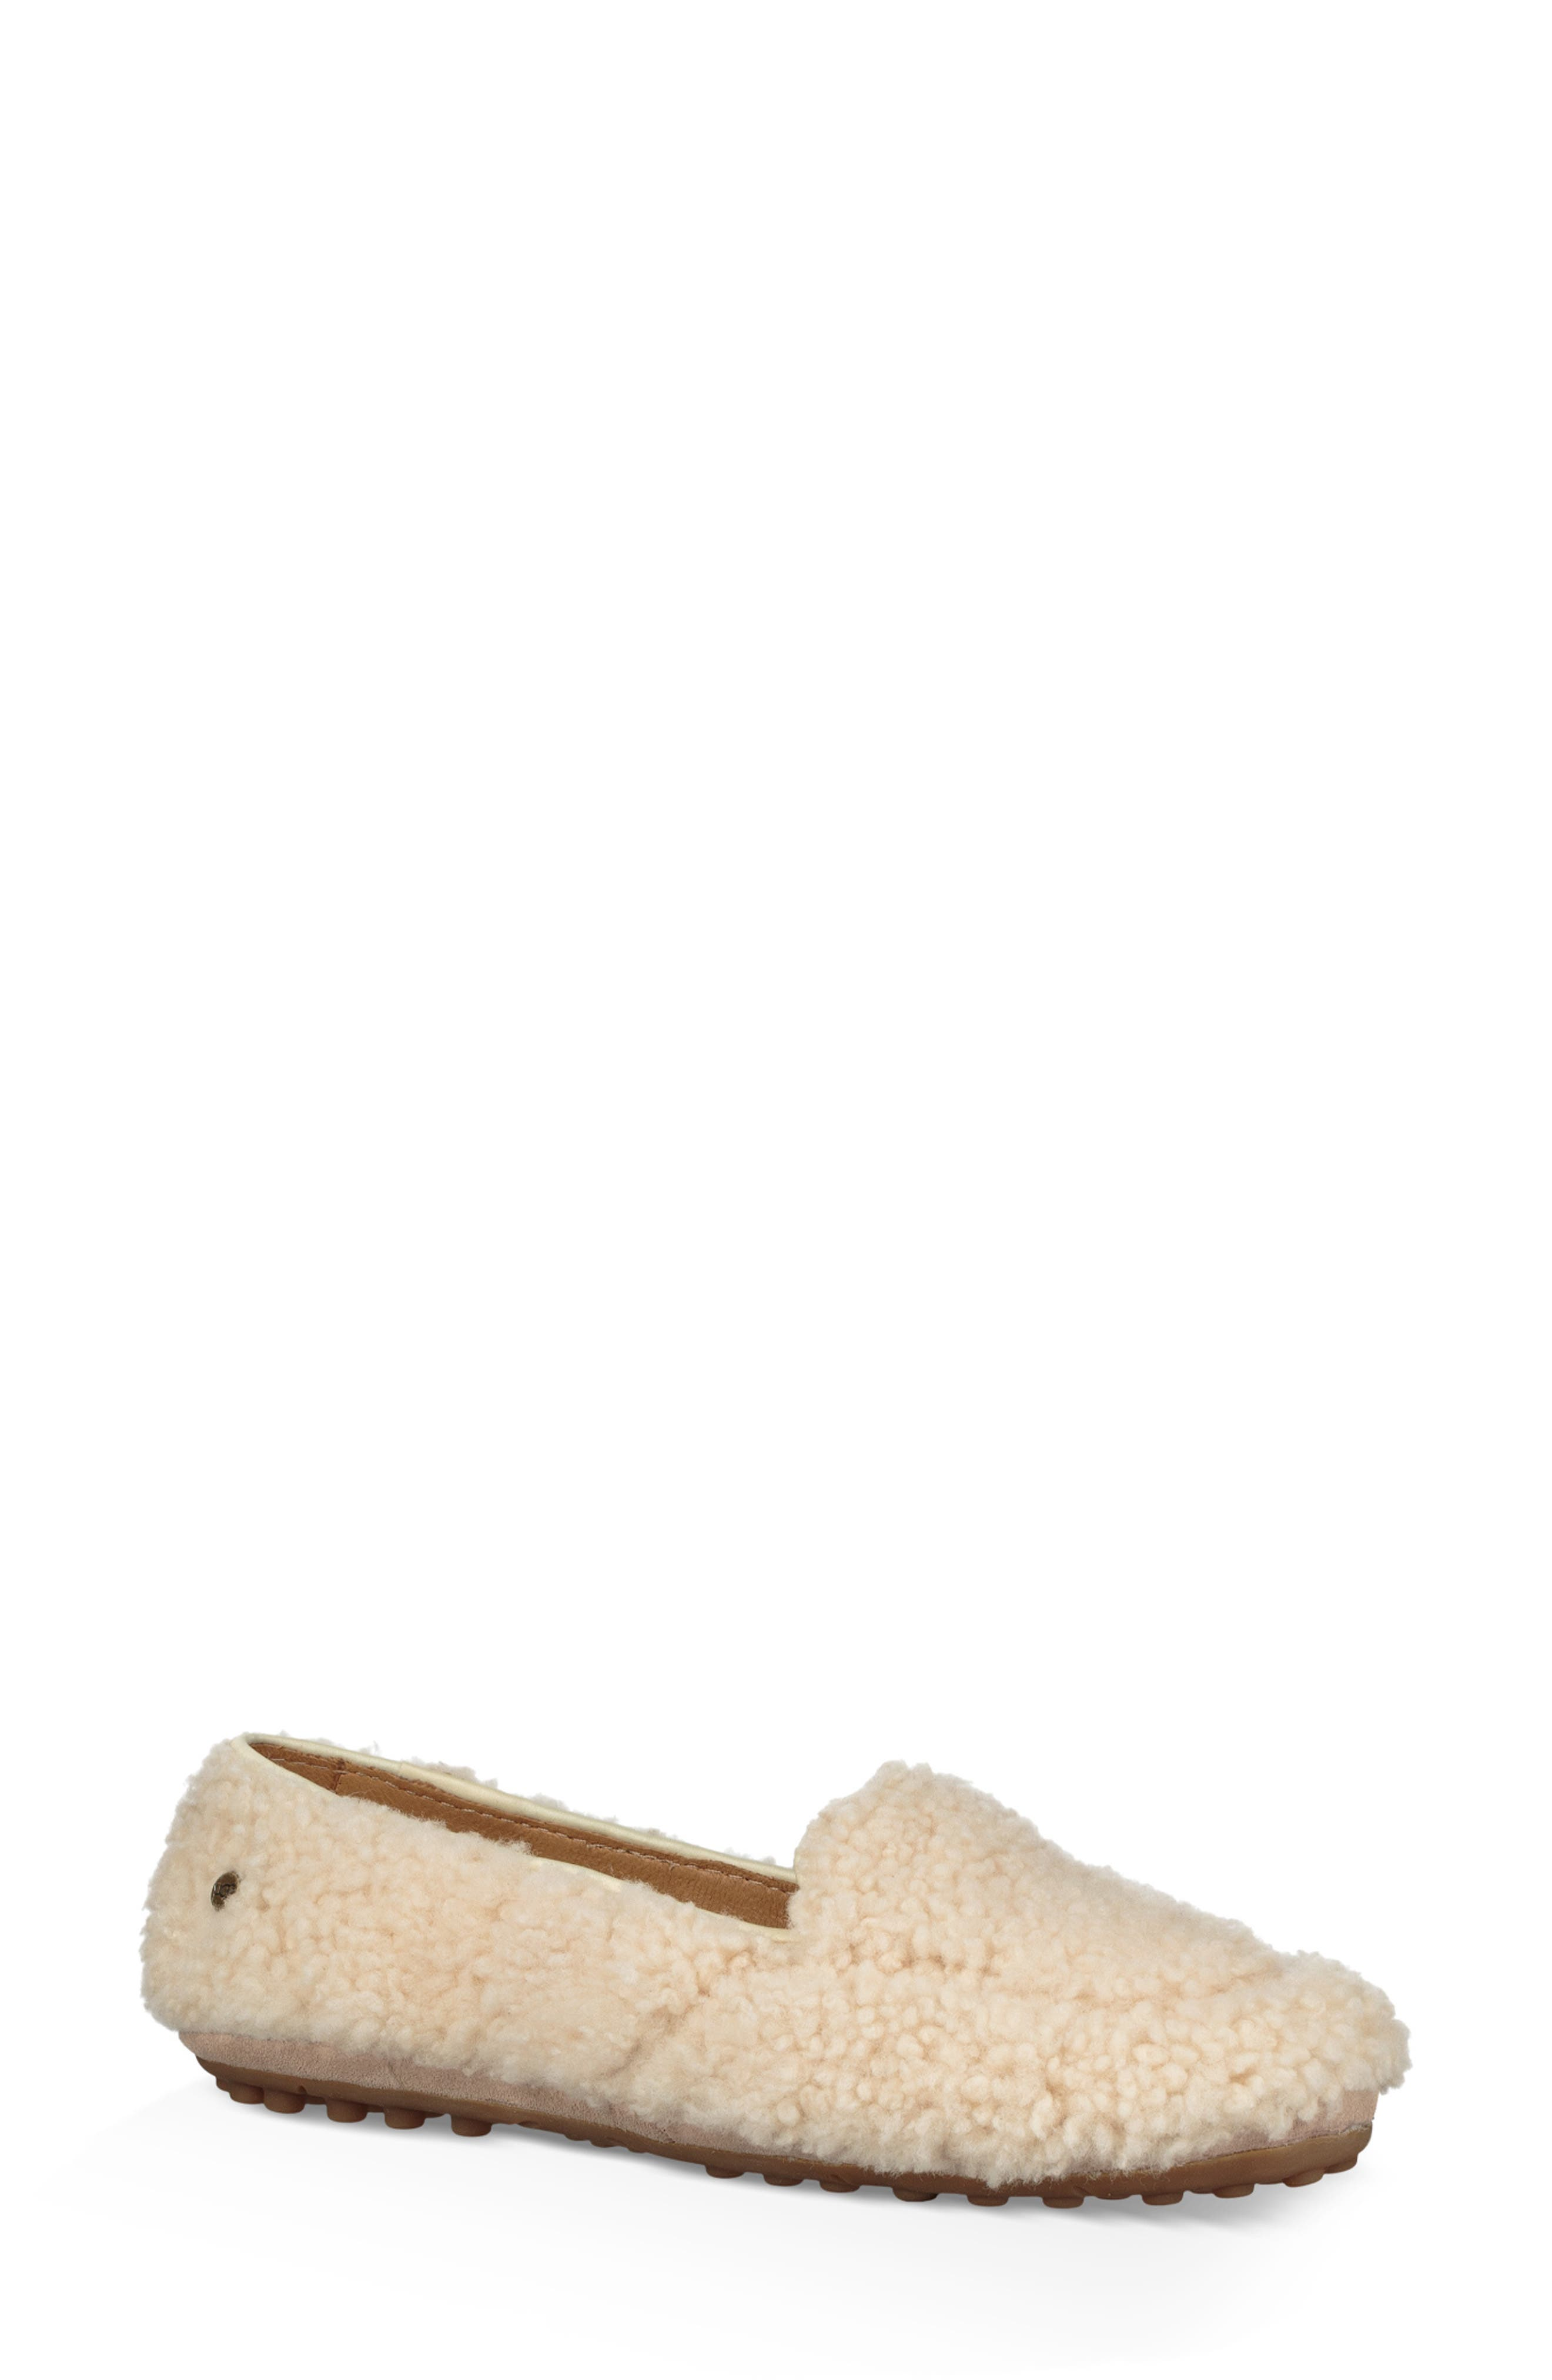 Ugg Hailey Fluff Genuine Shearling Slipper, Beige